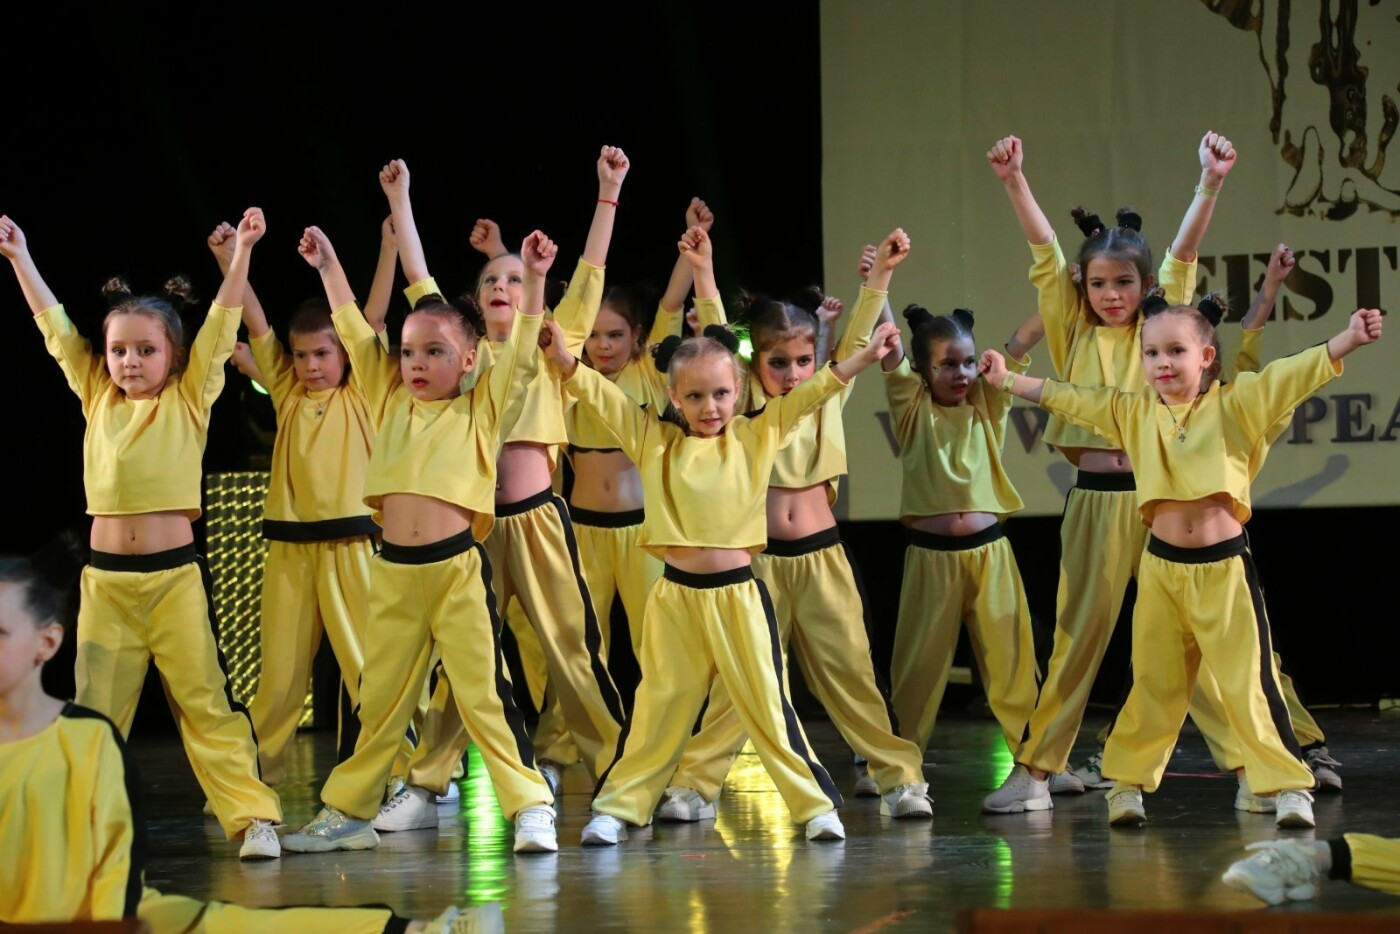 Танцы в Лозовой от А до Я: куда, когда и как?, фото-40